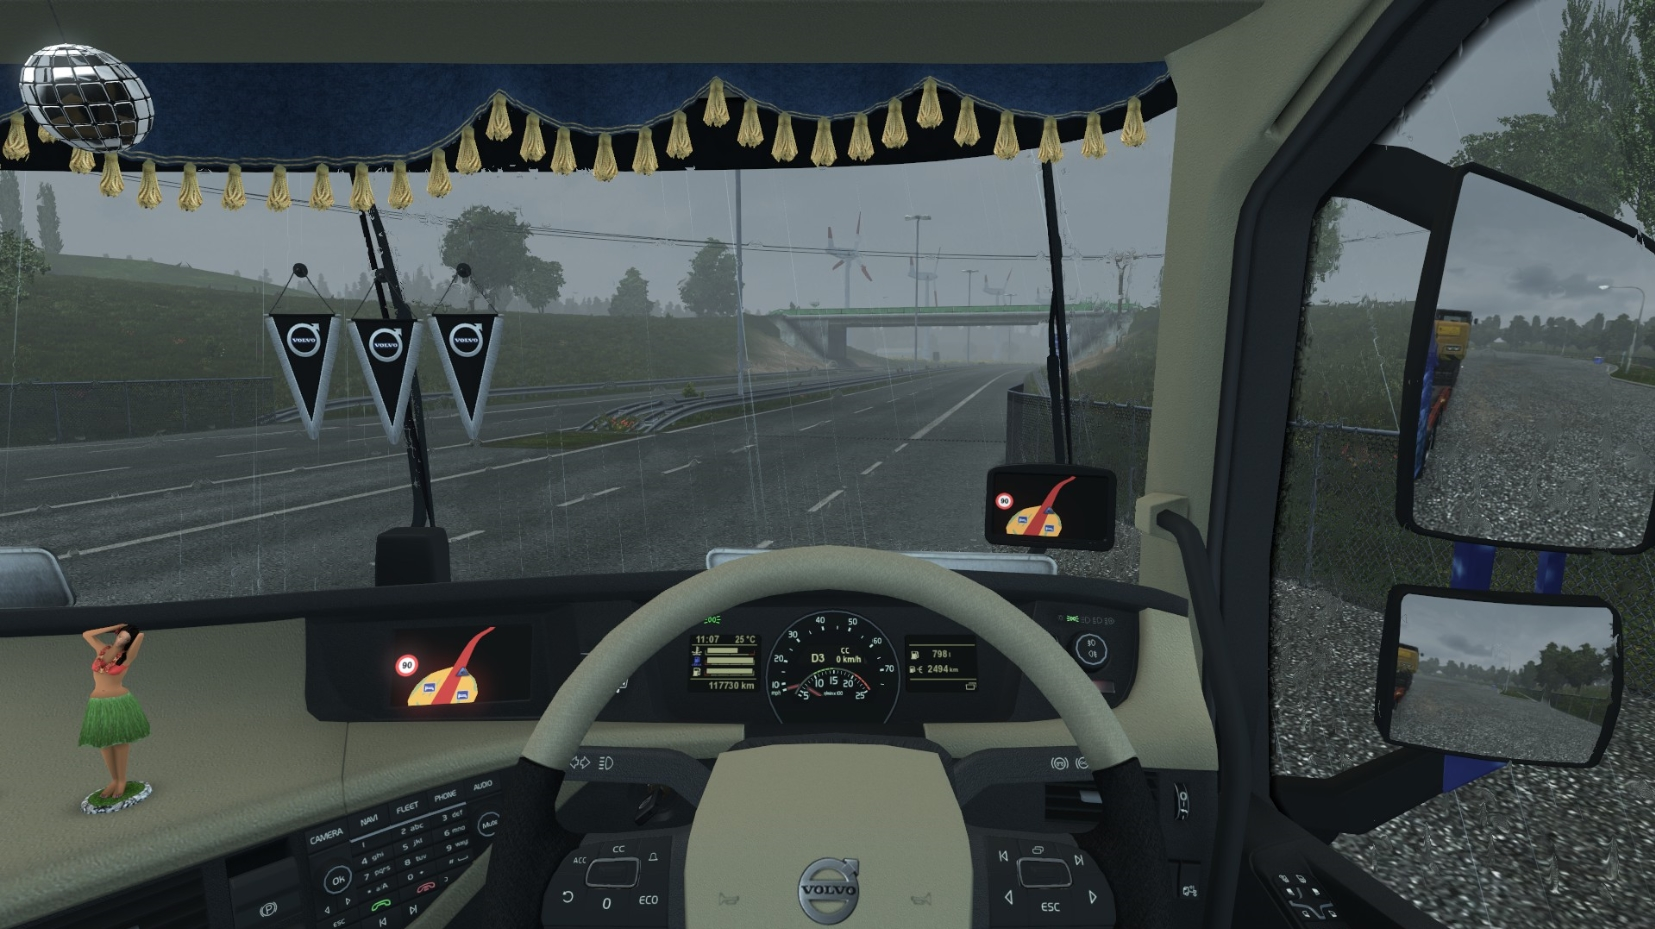 Dual monitor setup? - Solved Topics - TruckersMP Forum